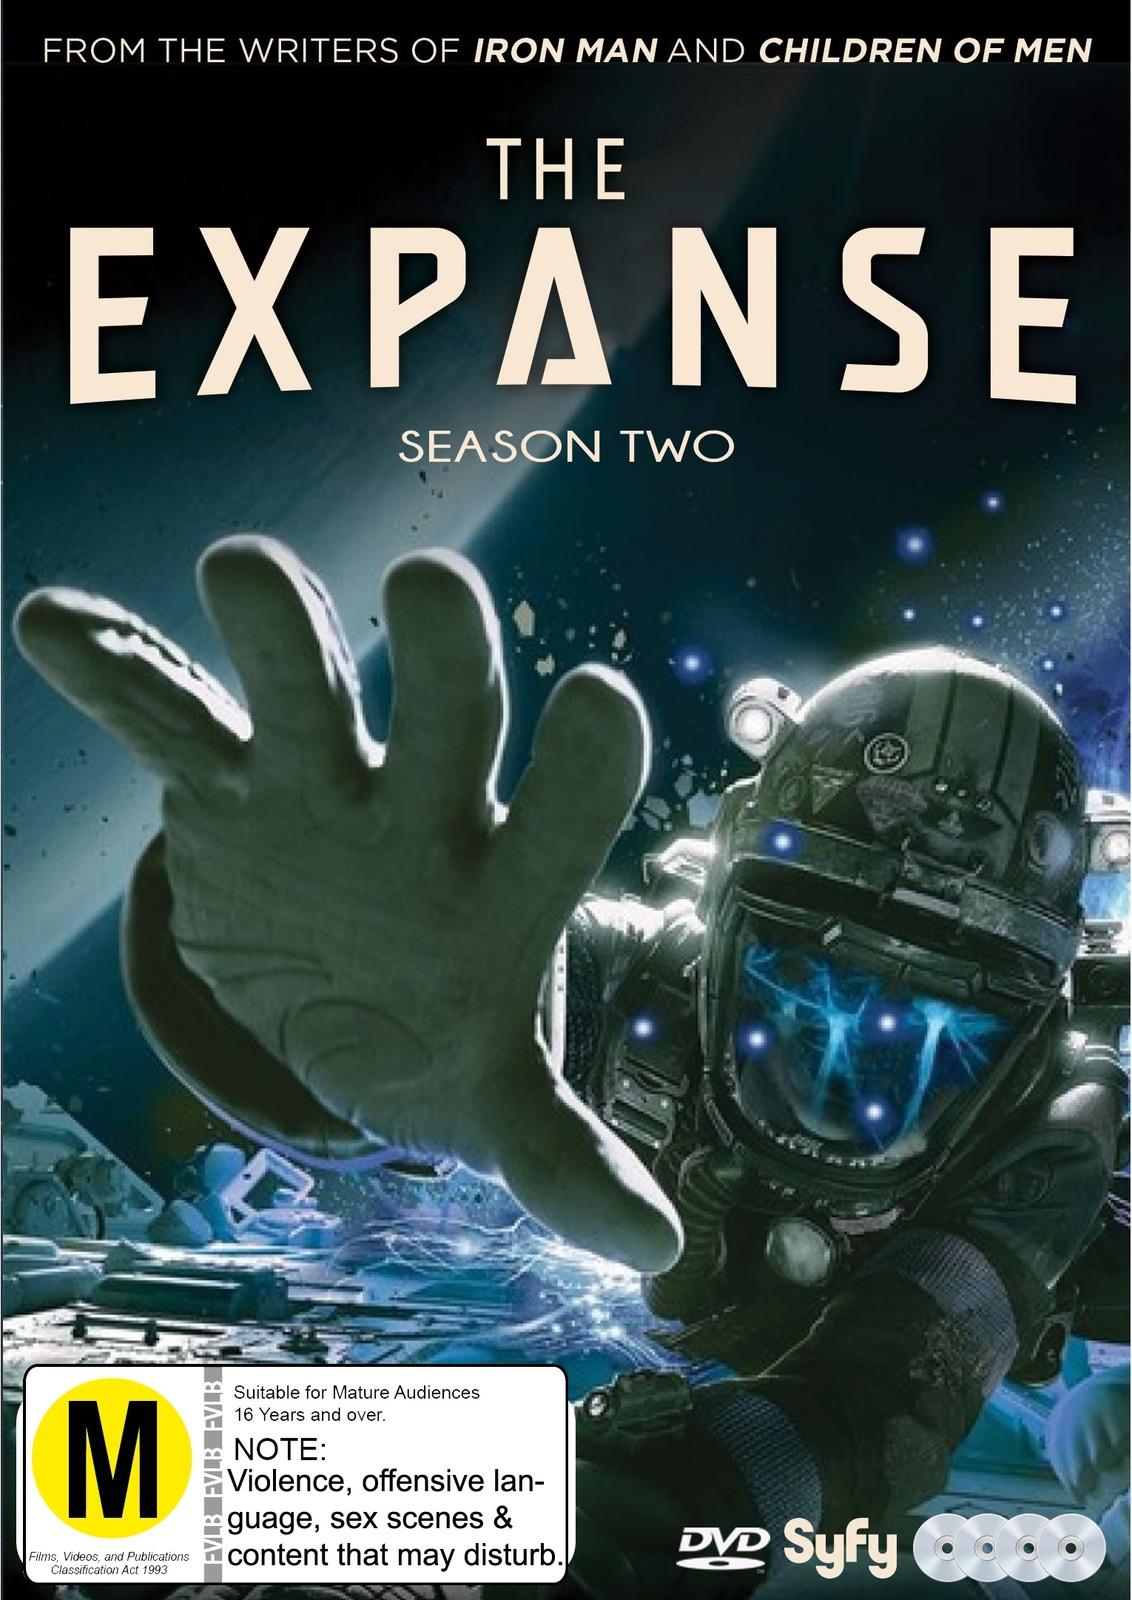 The Expanse: Season Two on DVD image